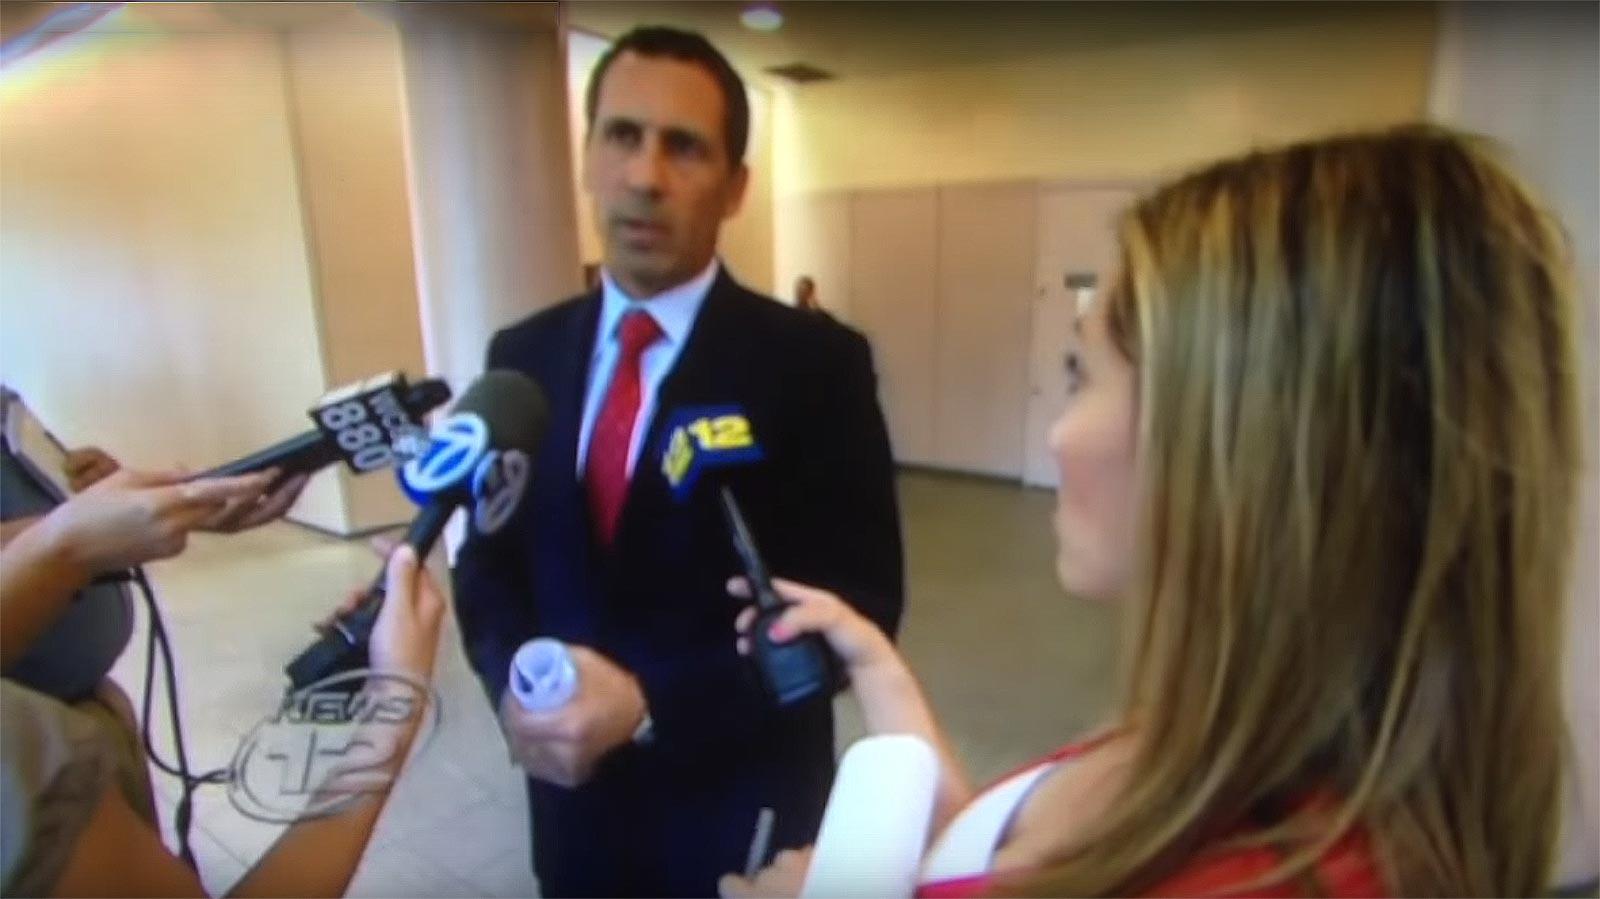 Suffolk County Criminal Defense Attorney Ed Palermo